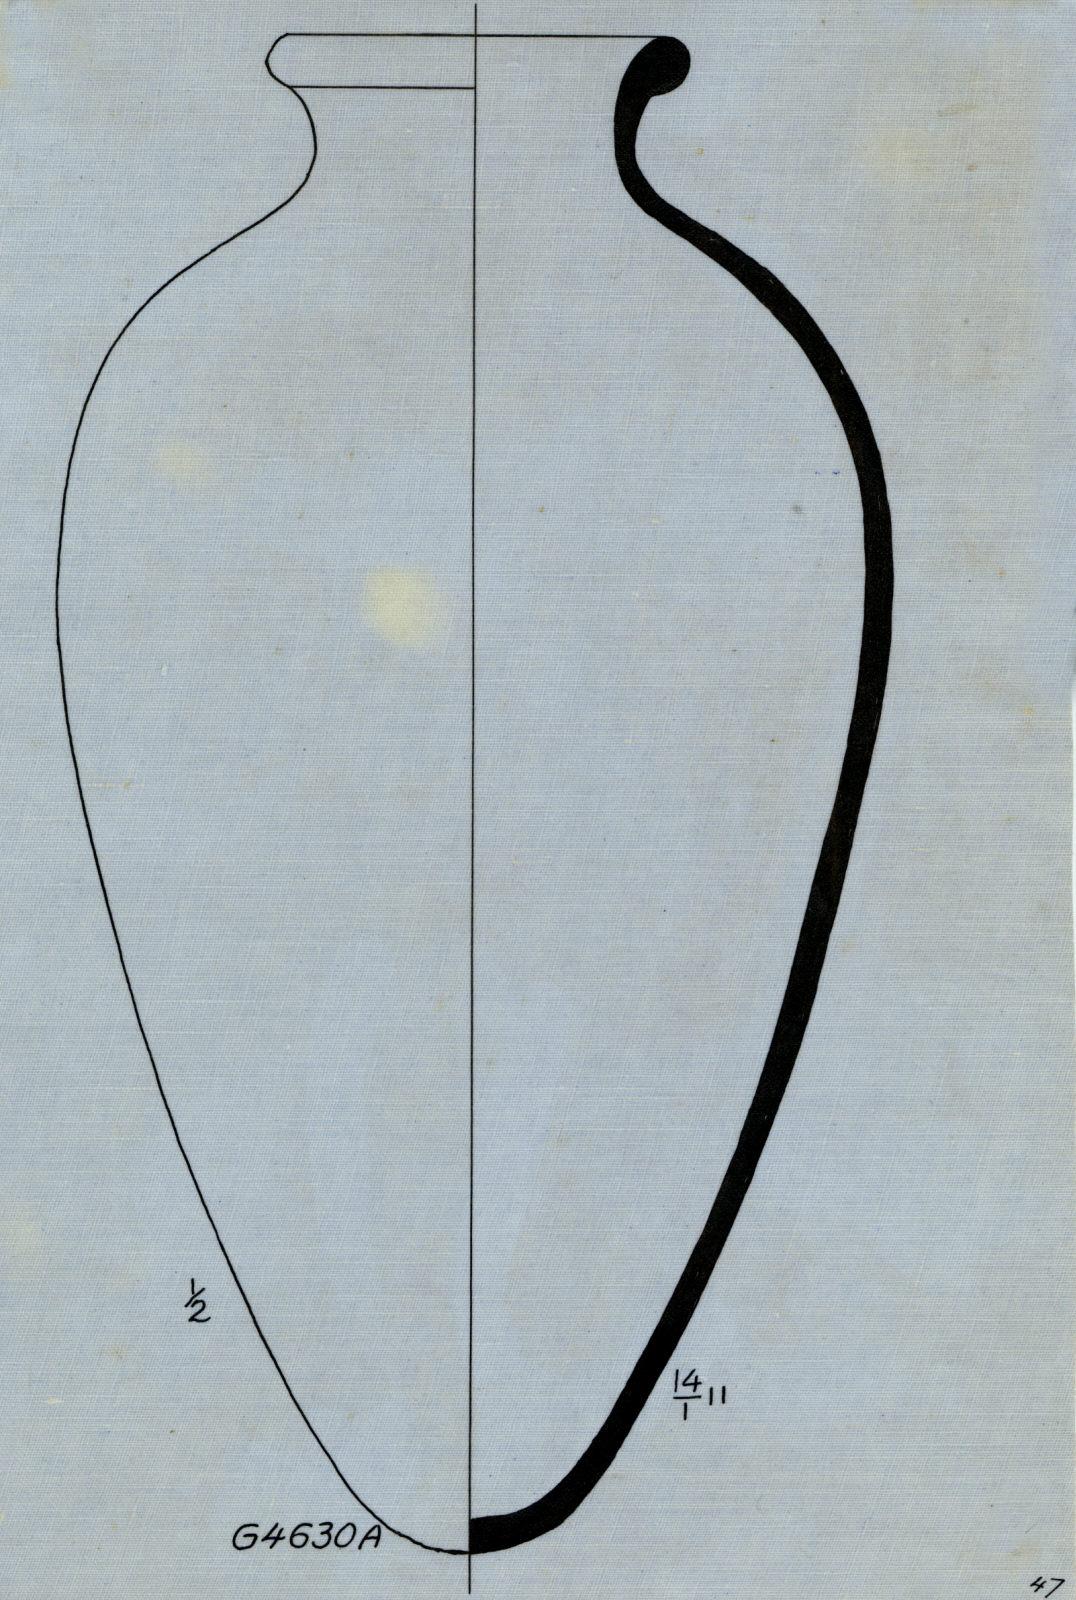 Drawings: G 4630, Shaft A: pottery, jar